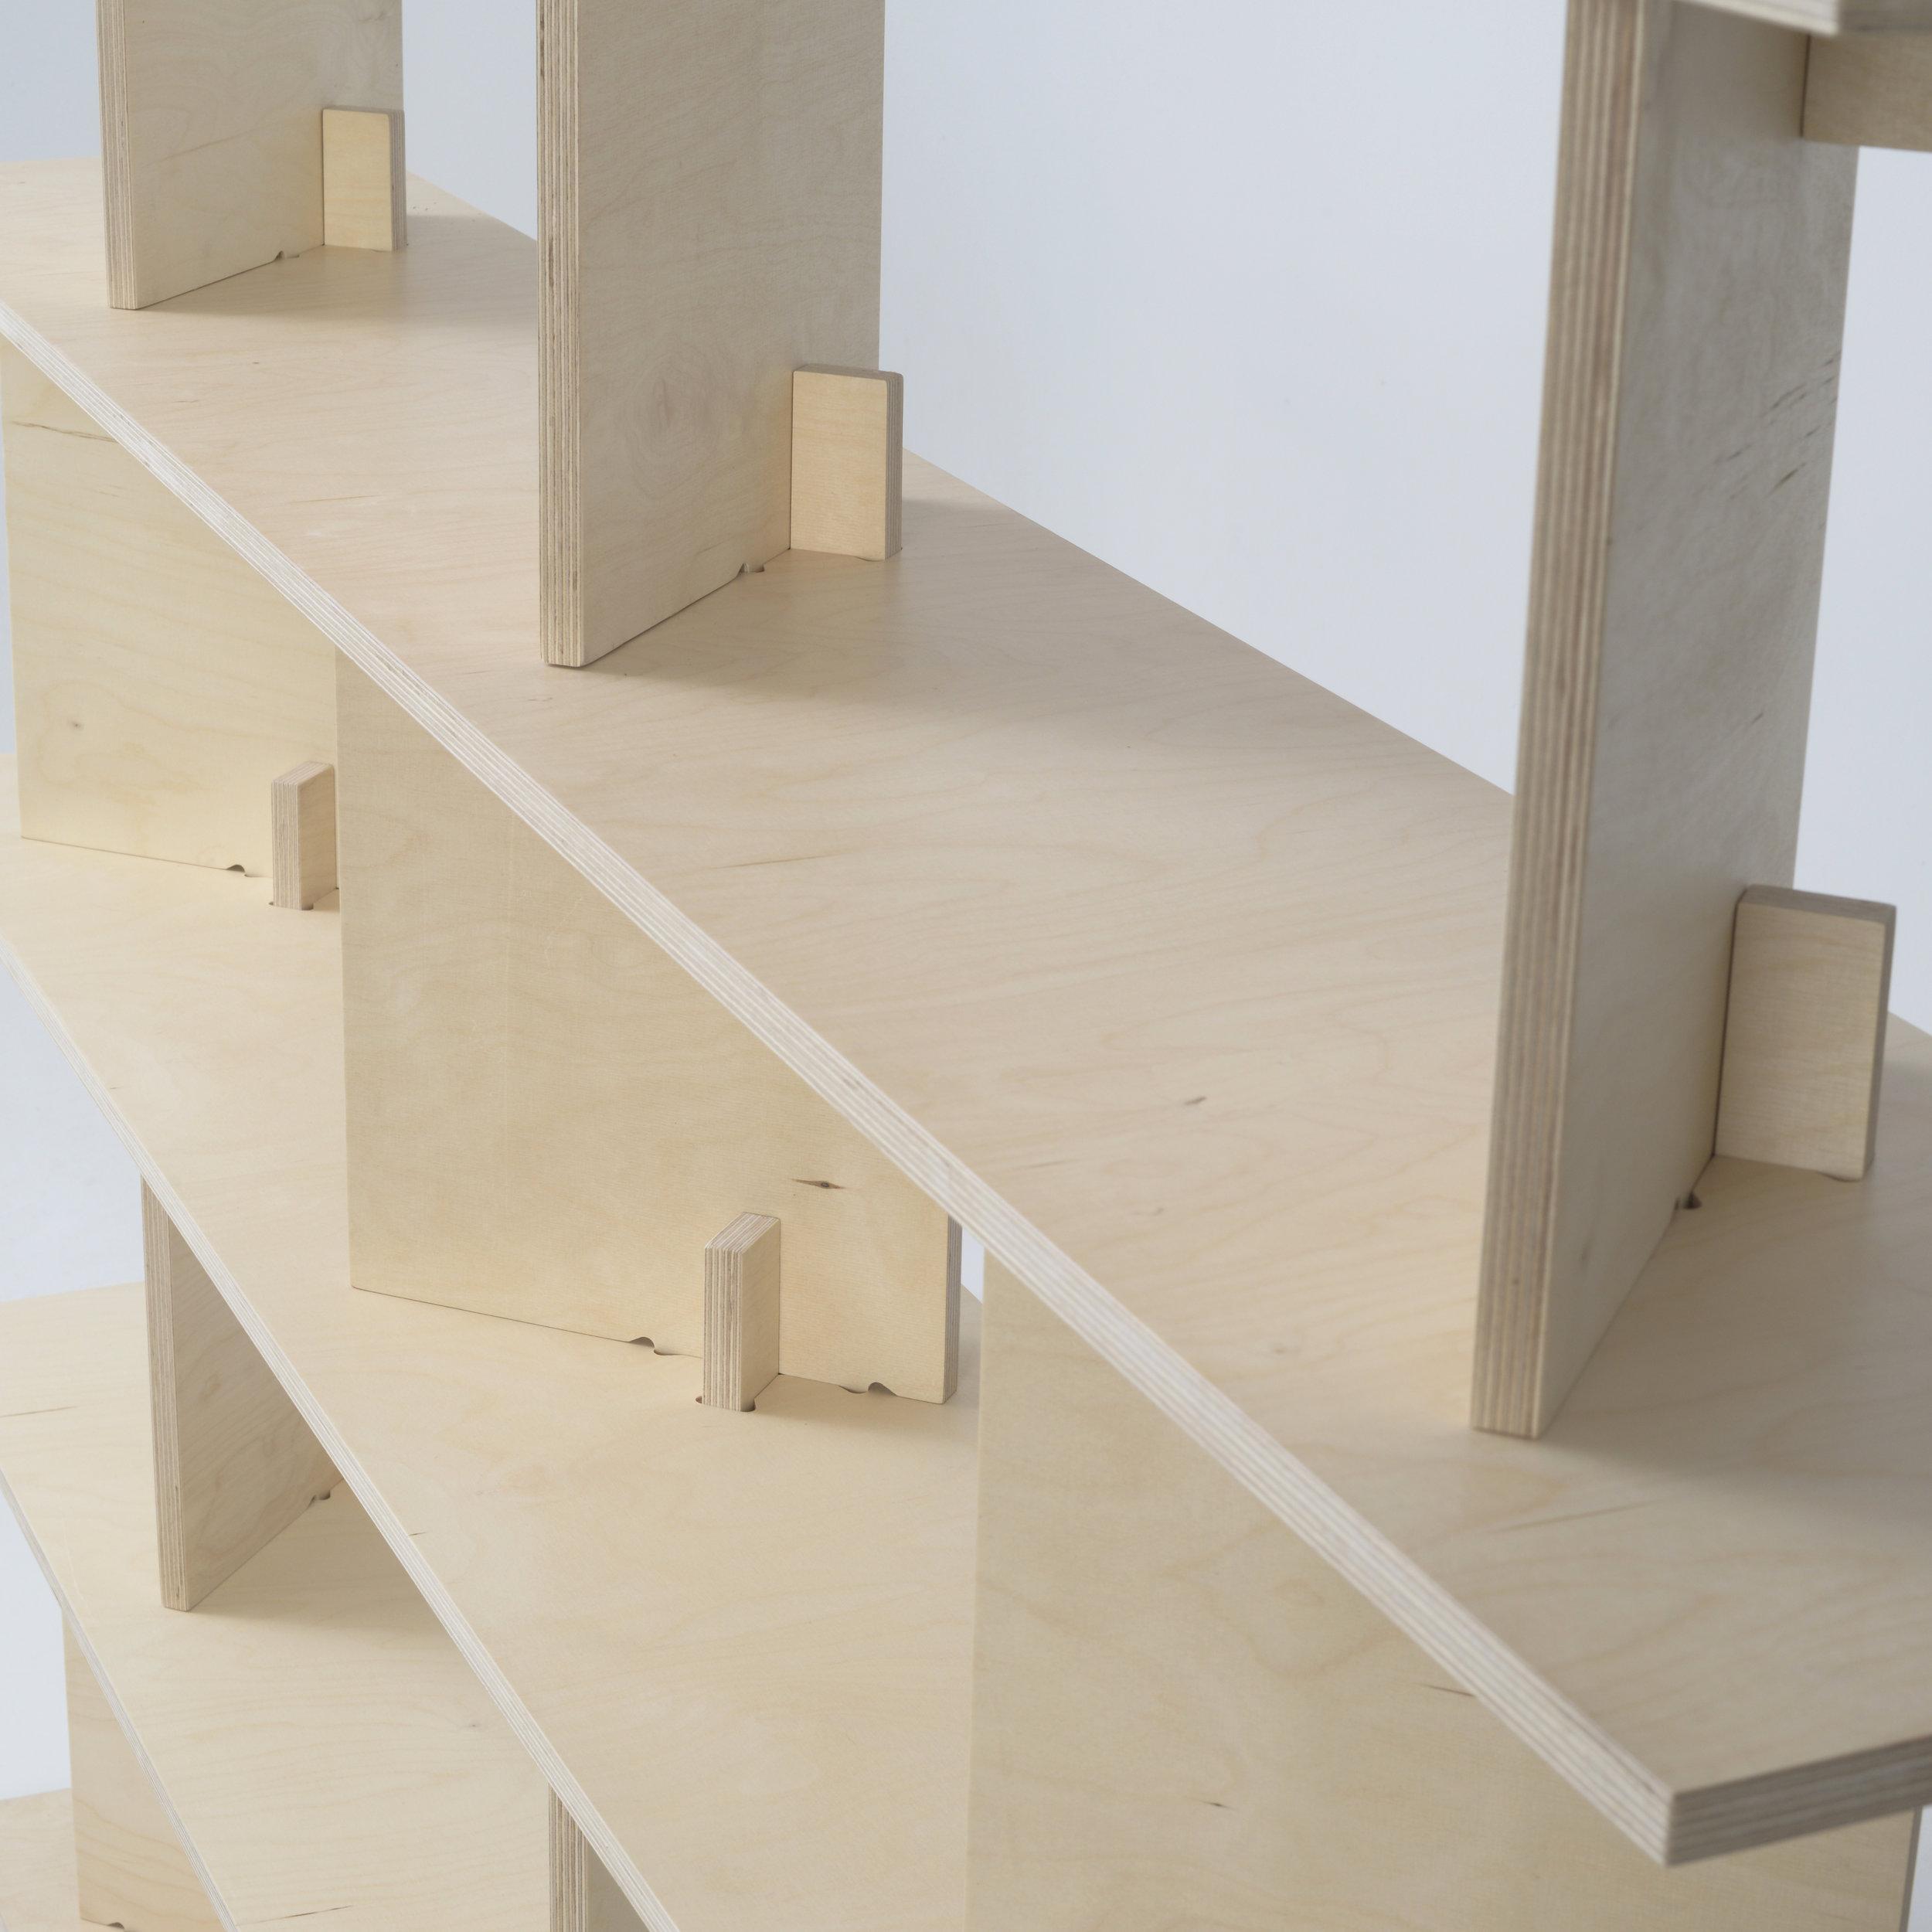 FIT_Furniture-Neubau_shelf_detail-Ronen_Kadushin